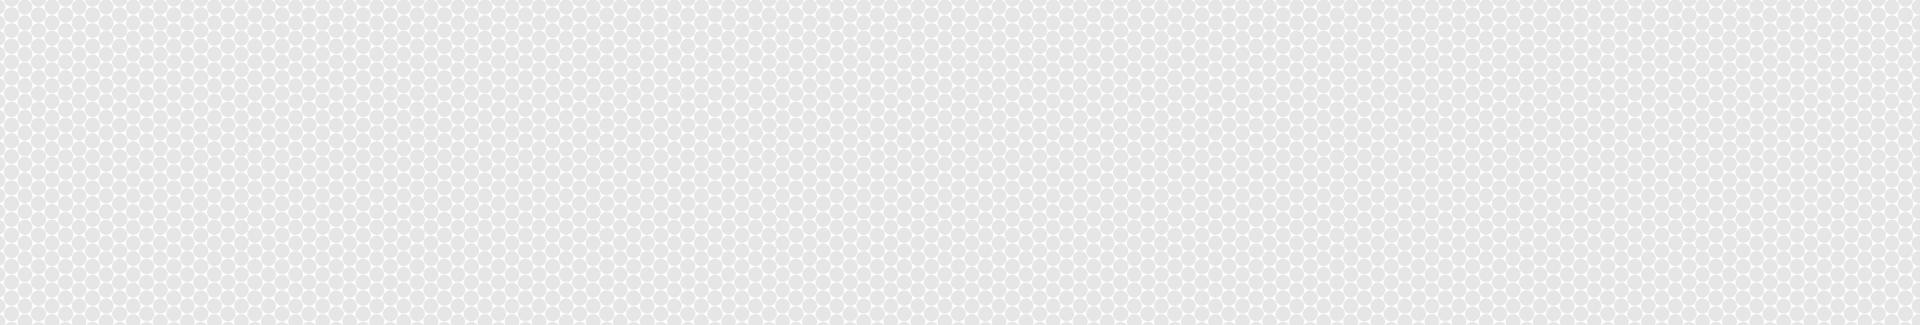 Header_Support_Online-support-background-1920×325